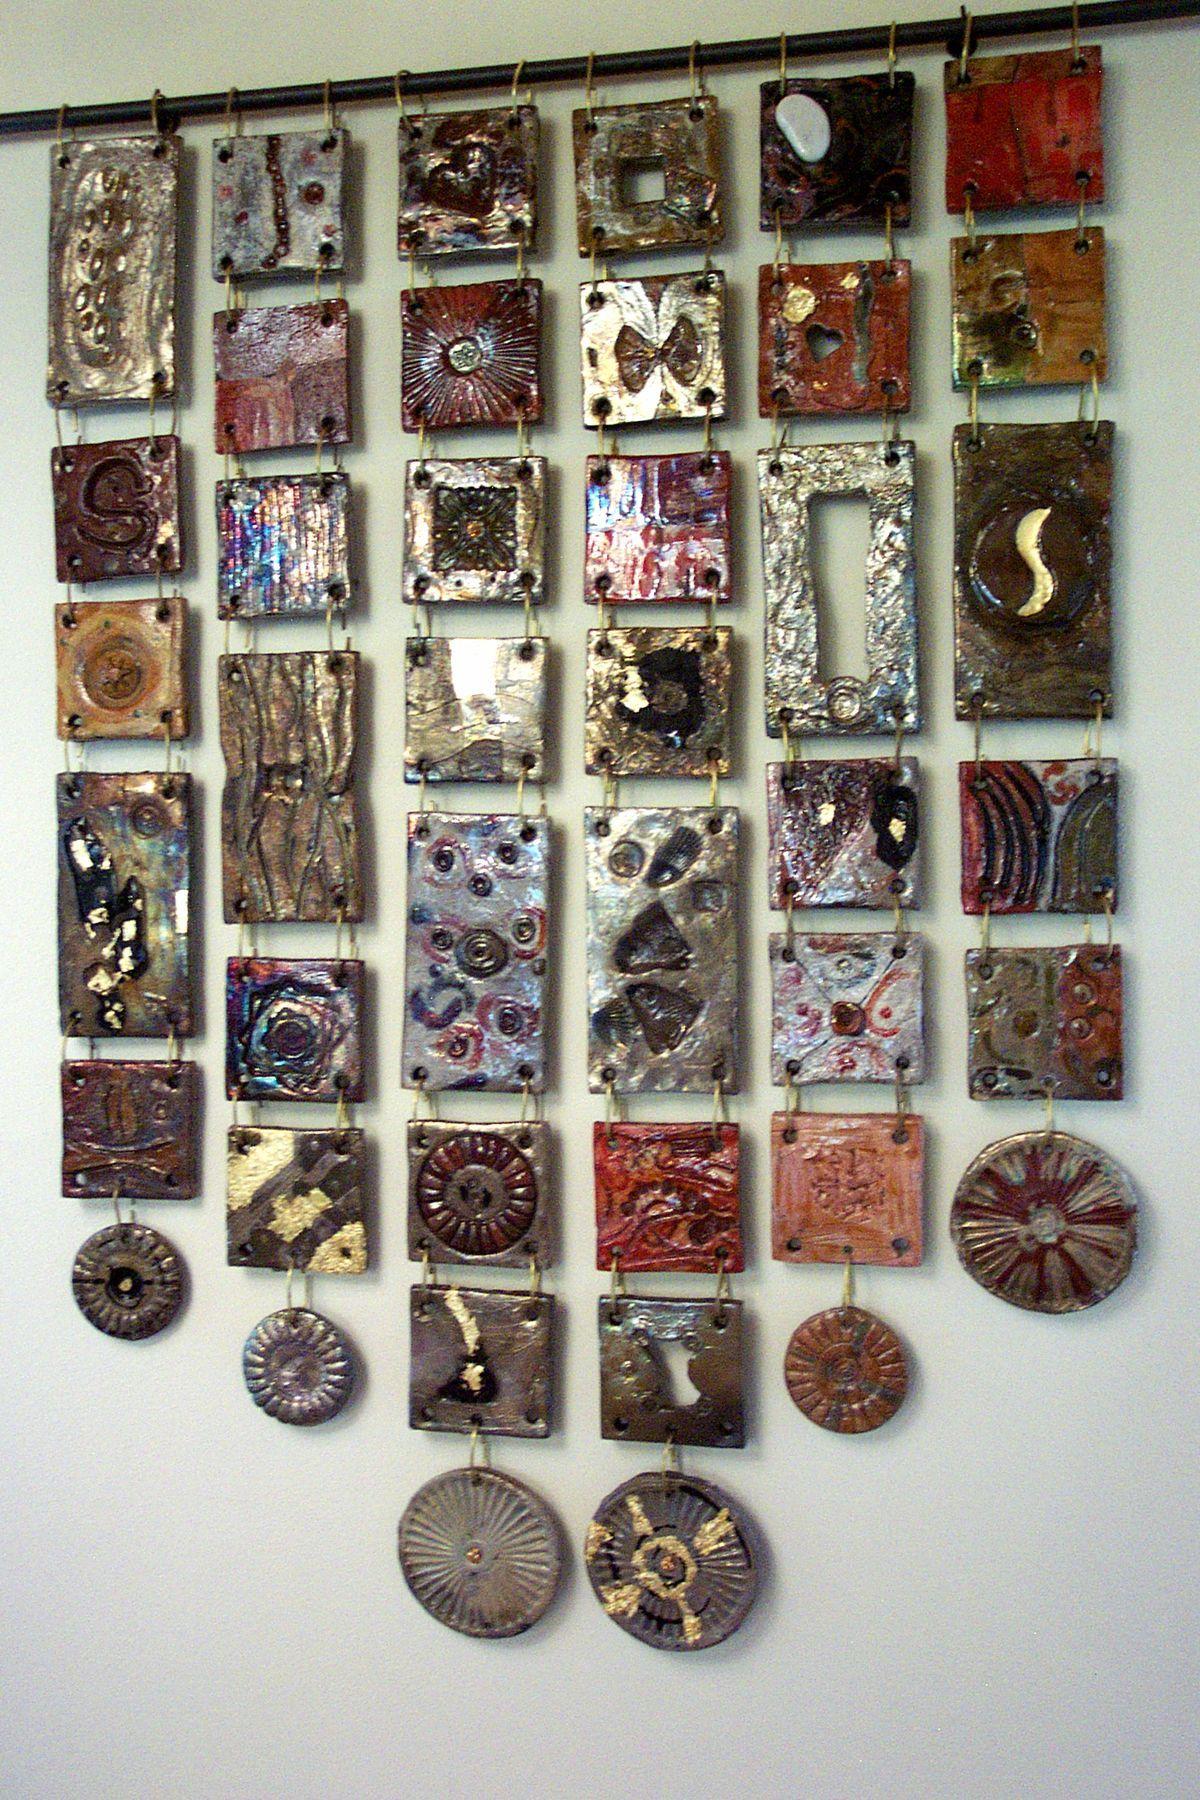 Pin by veronica markley on art club pinterest pottery